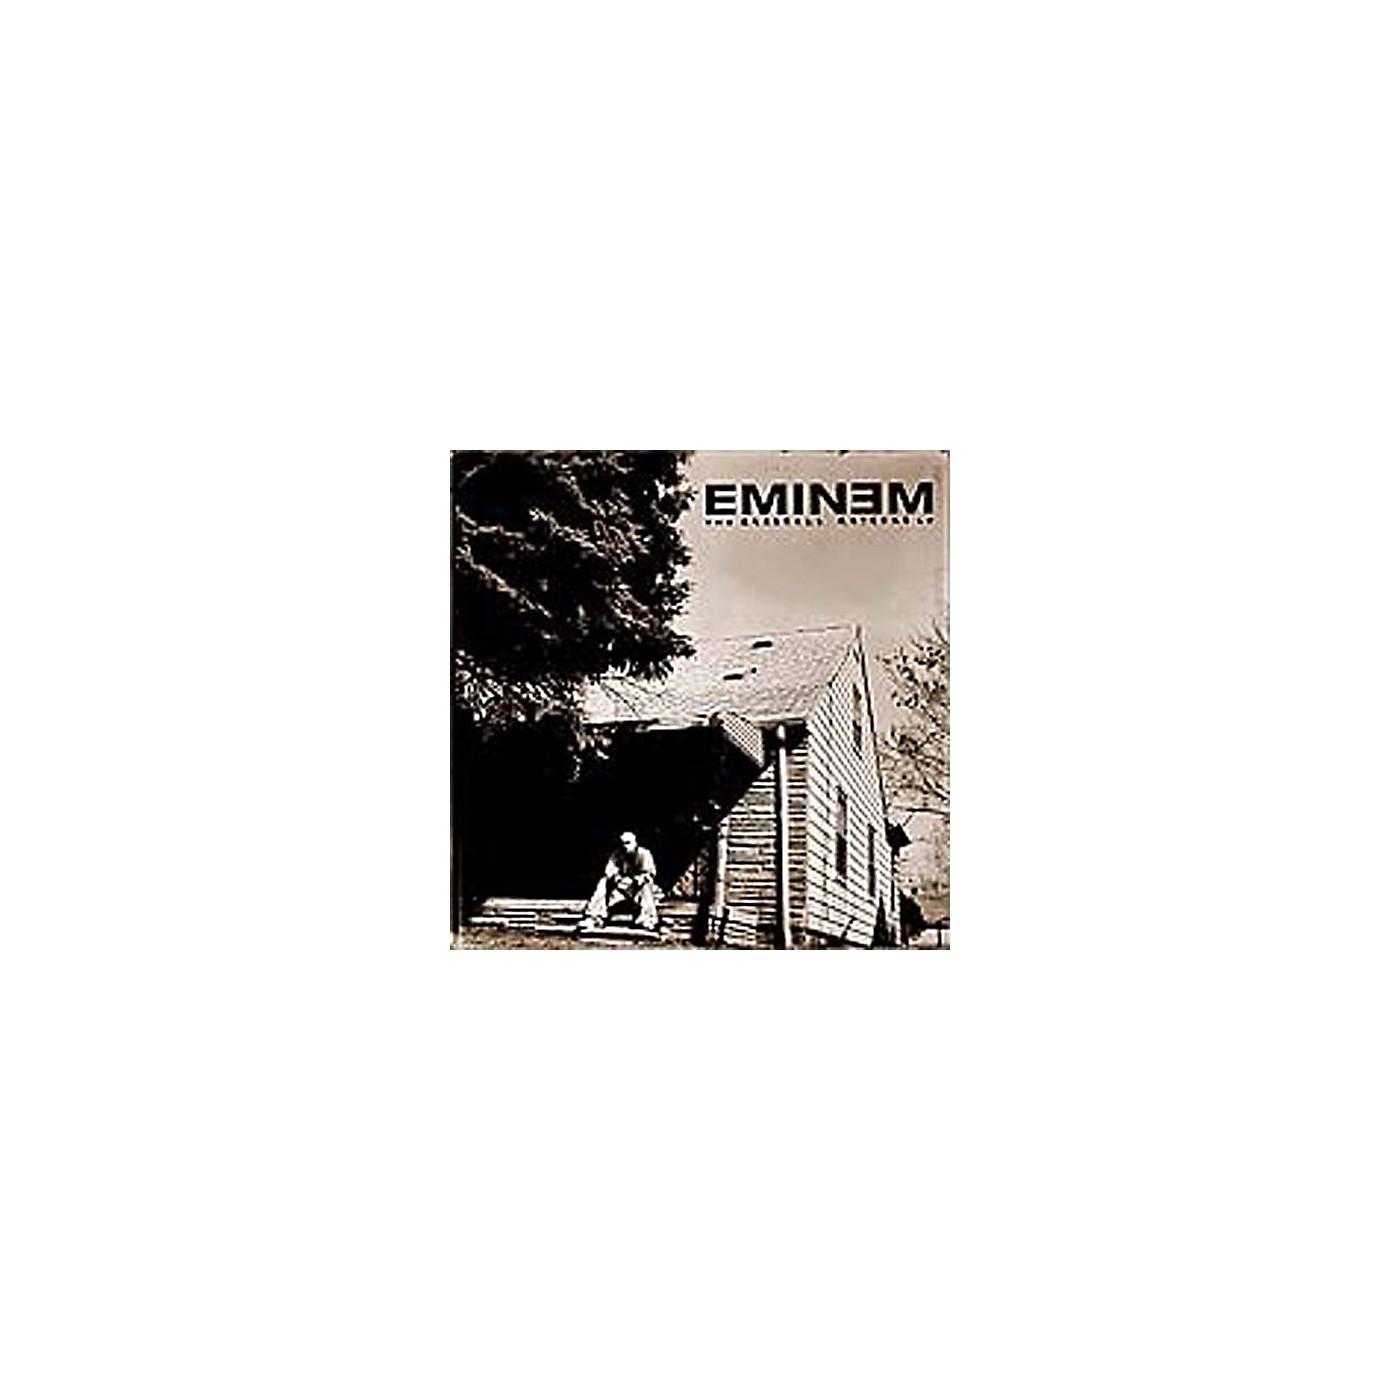 Universal Music Group Eminem - The Marshall Mathers LP thumbnail